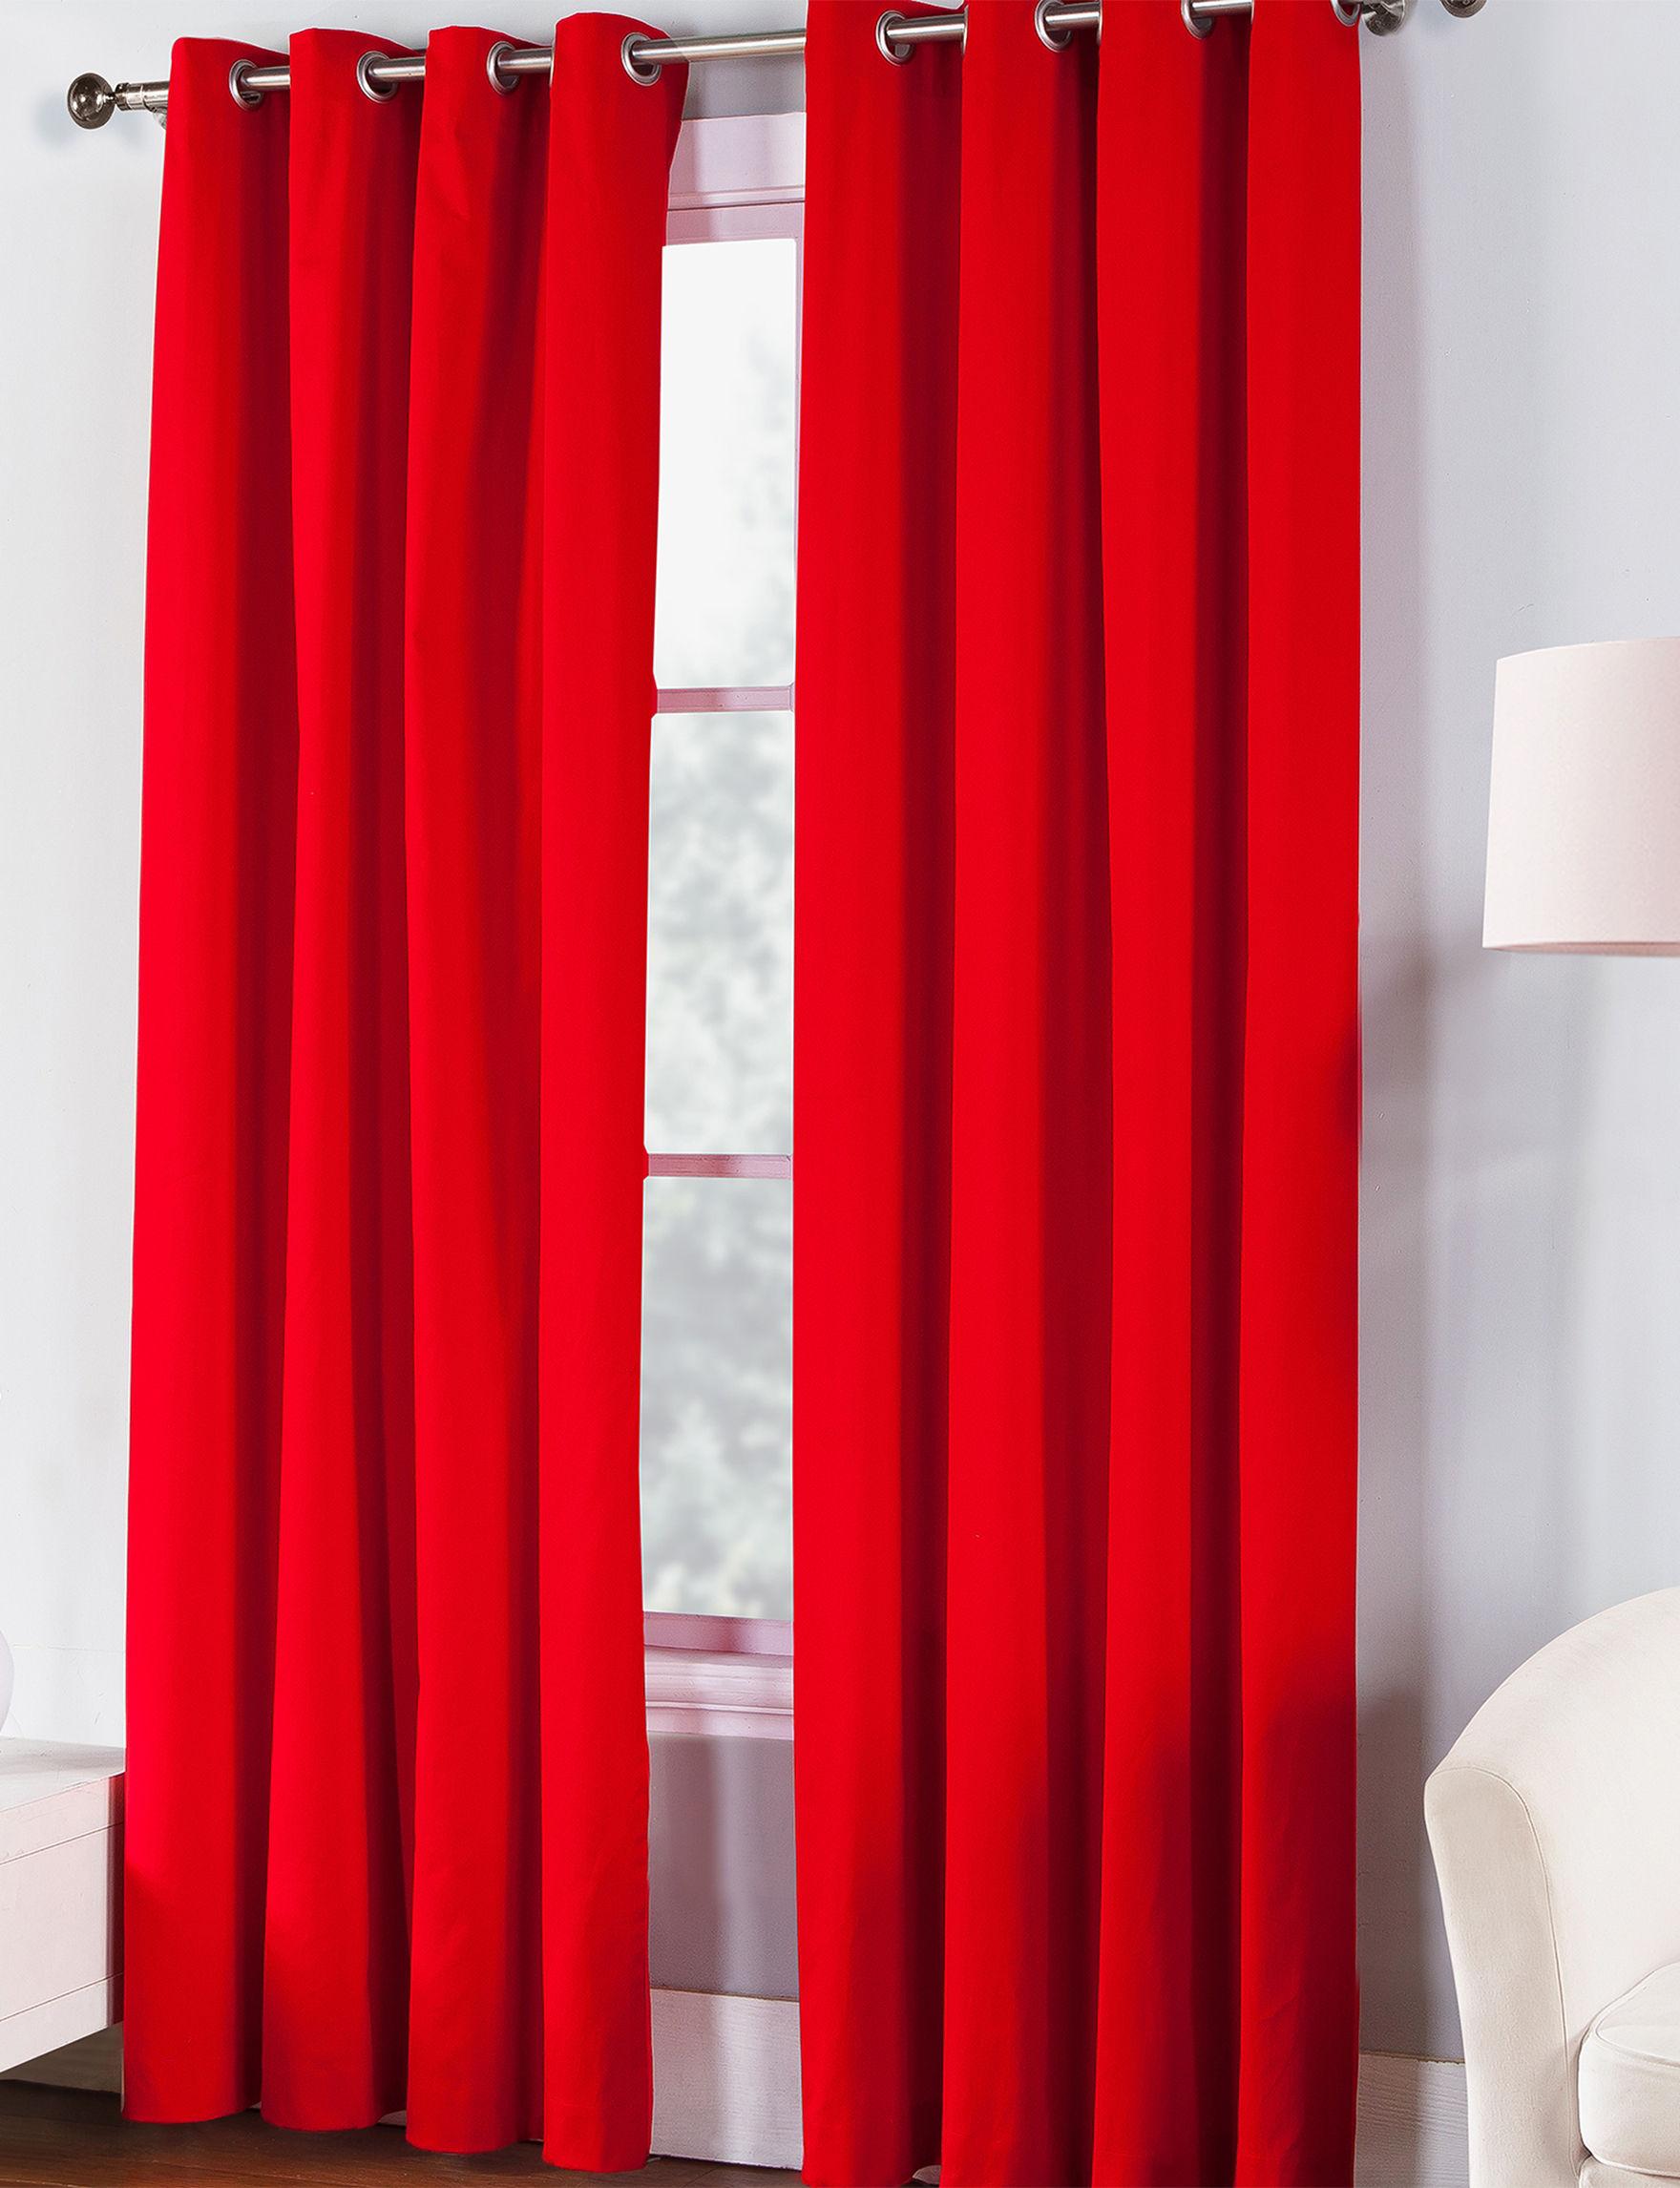 Fiesta Scarlet Curtains & Drapes Window Treatments